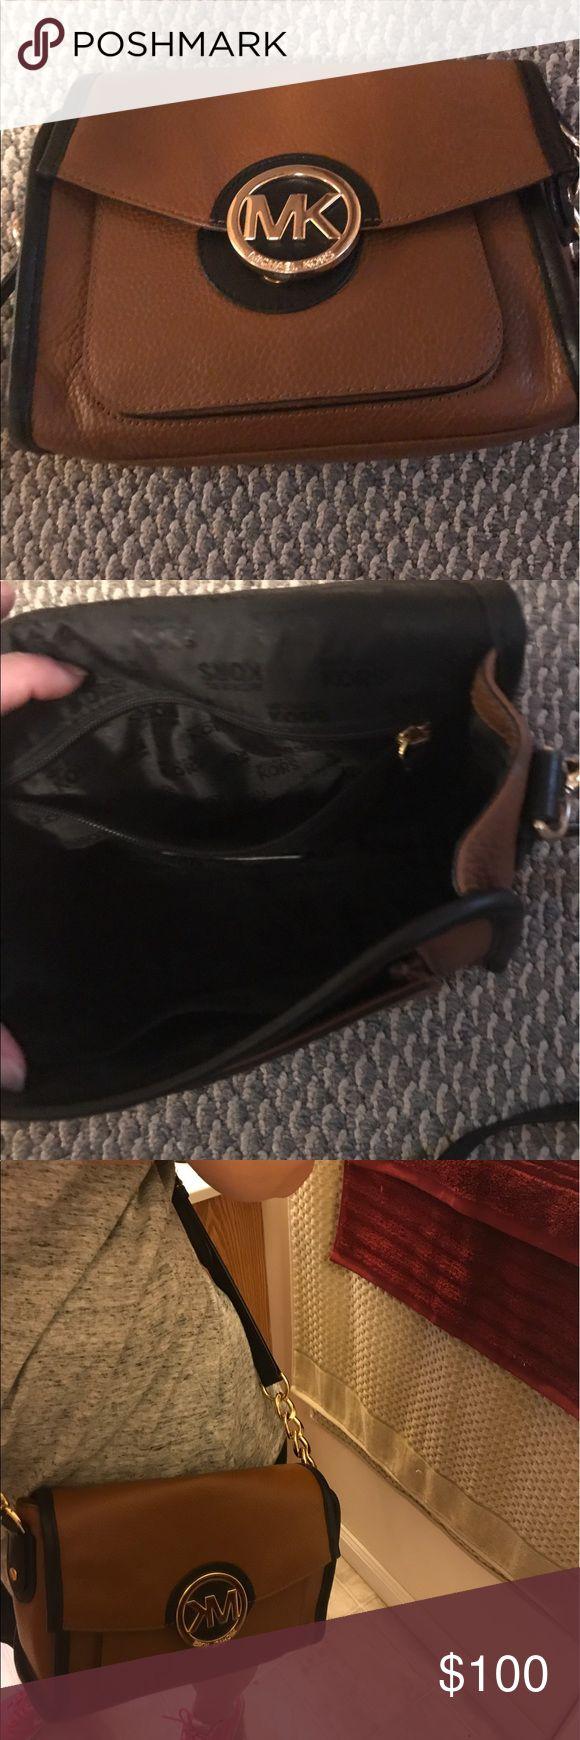 6044dcd0d3a6 used black michael kors tote black mk purses with tan stripes ...